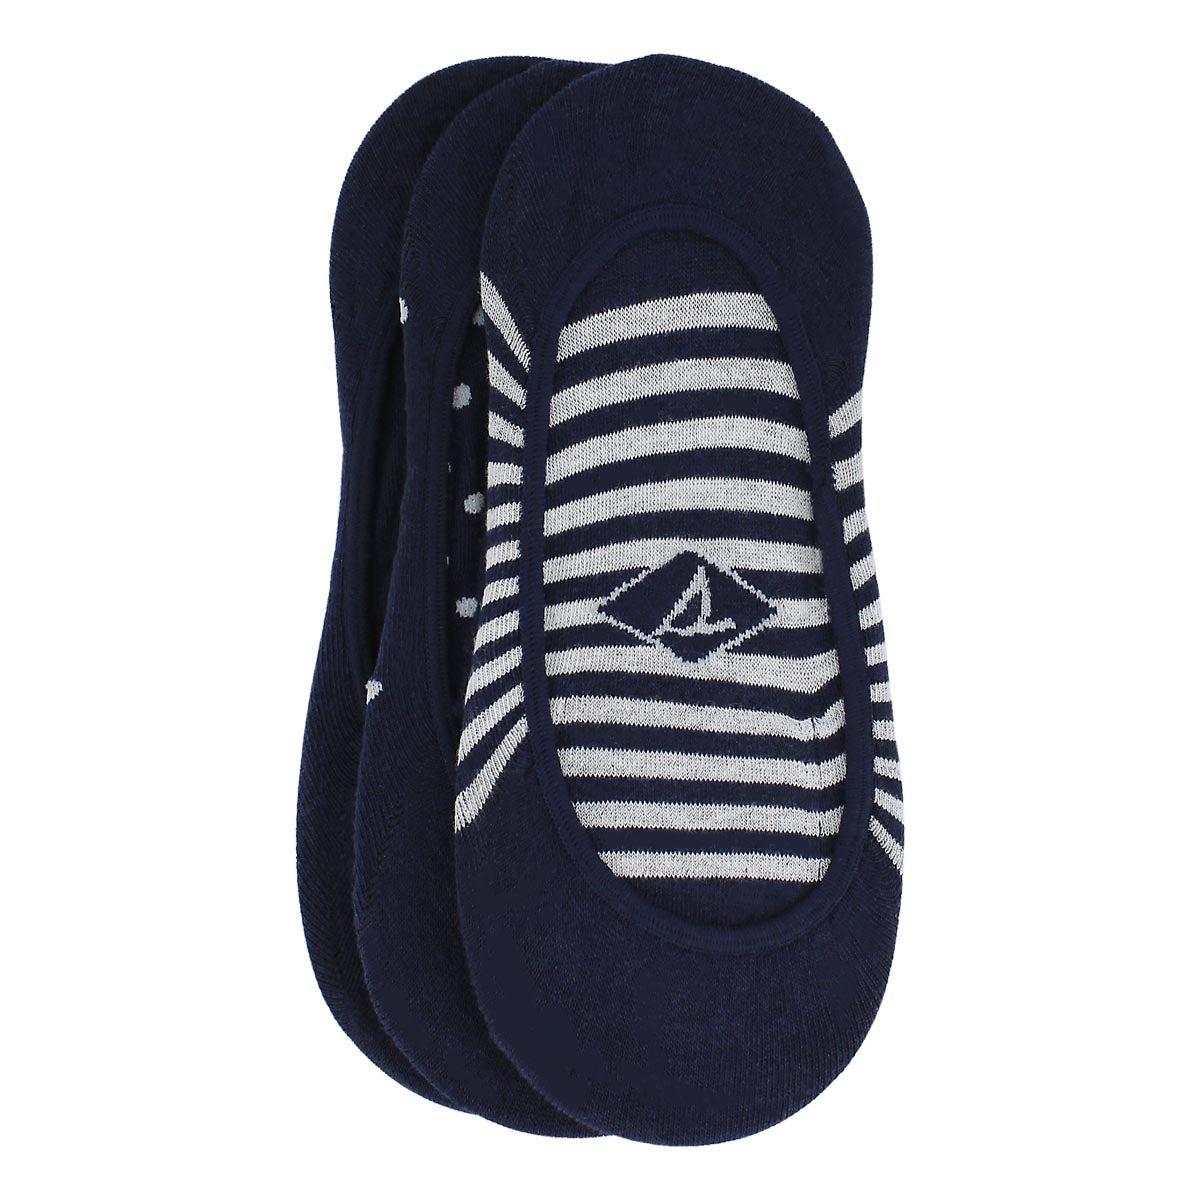 Lds Stripes & Dots navy liner- 3pk